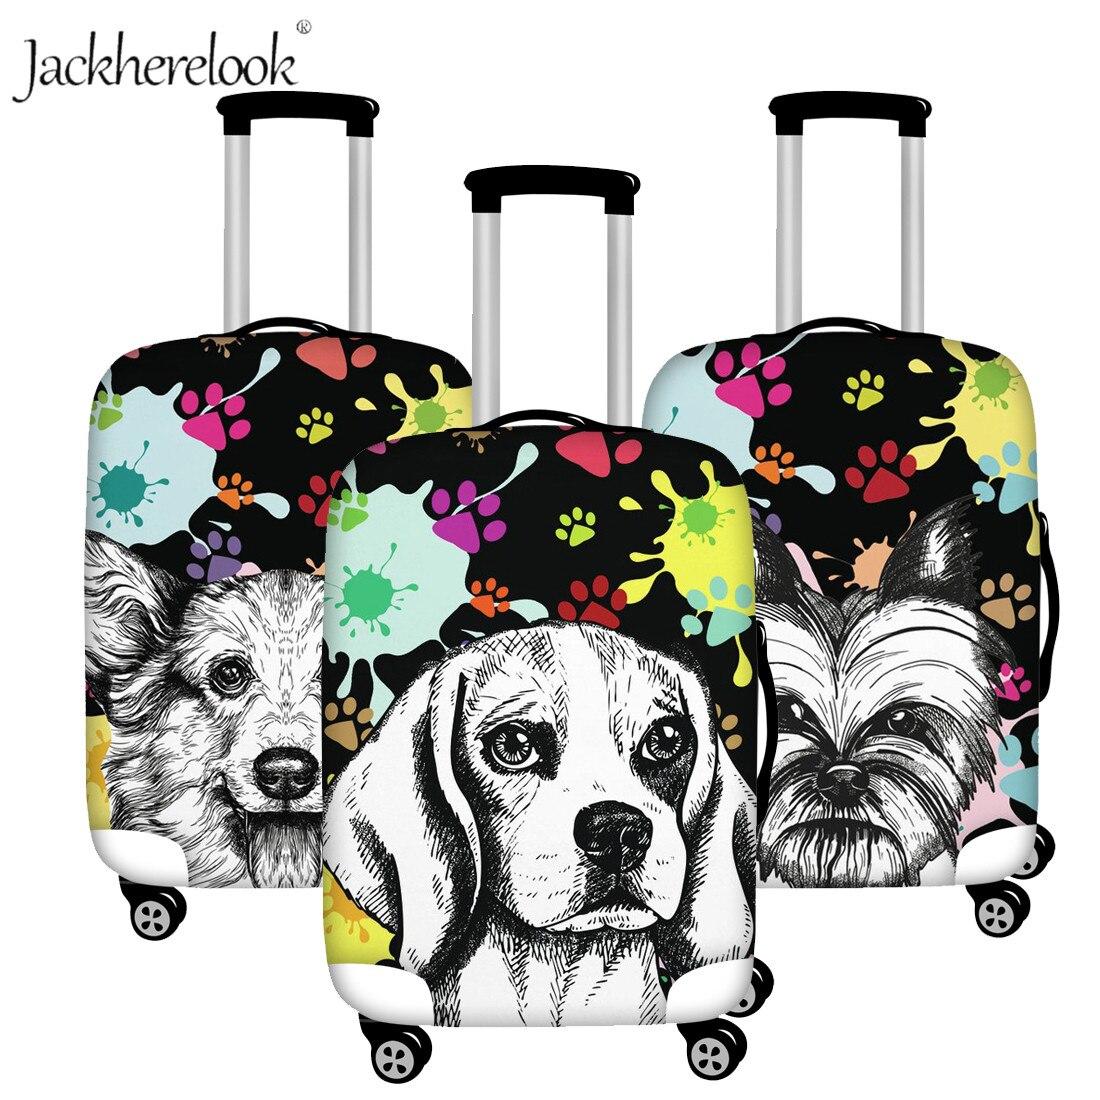 Jackherelook Artsy Beagle/Yorkie/Boston Dog Print Luggage Protect Cover Elastic Trave Suitcase Bag Case Dirtyproof Trolley Sheet